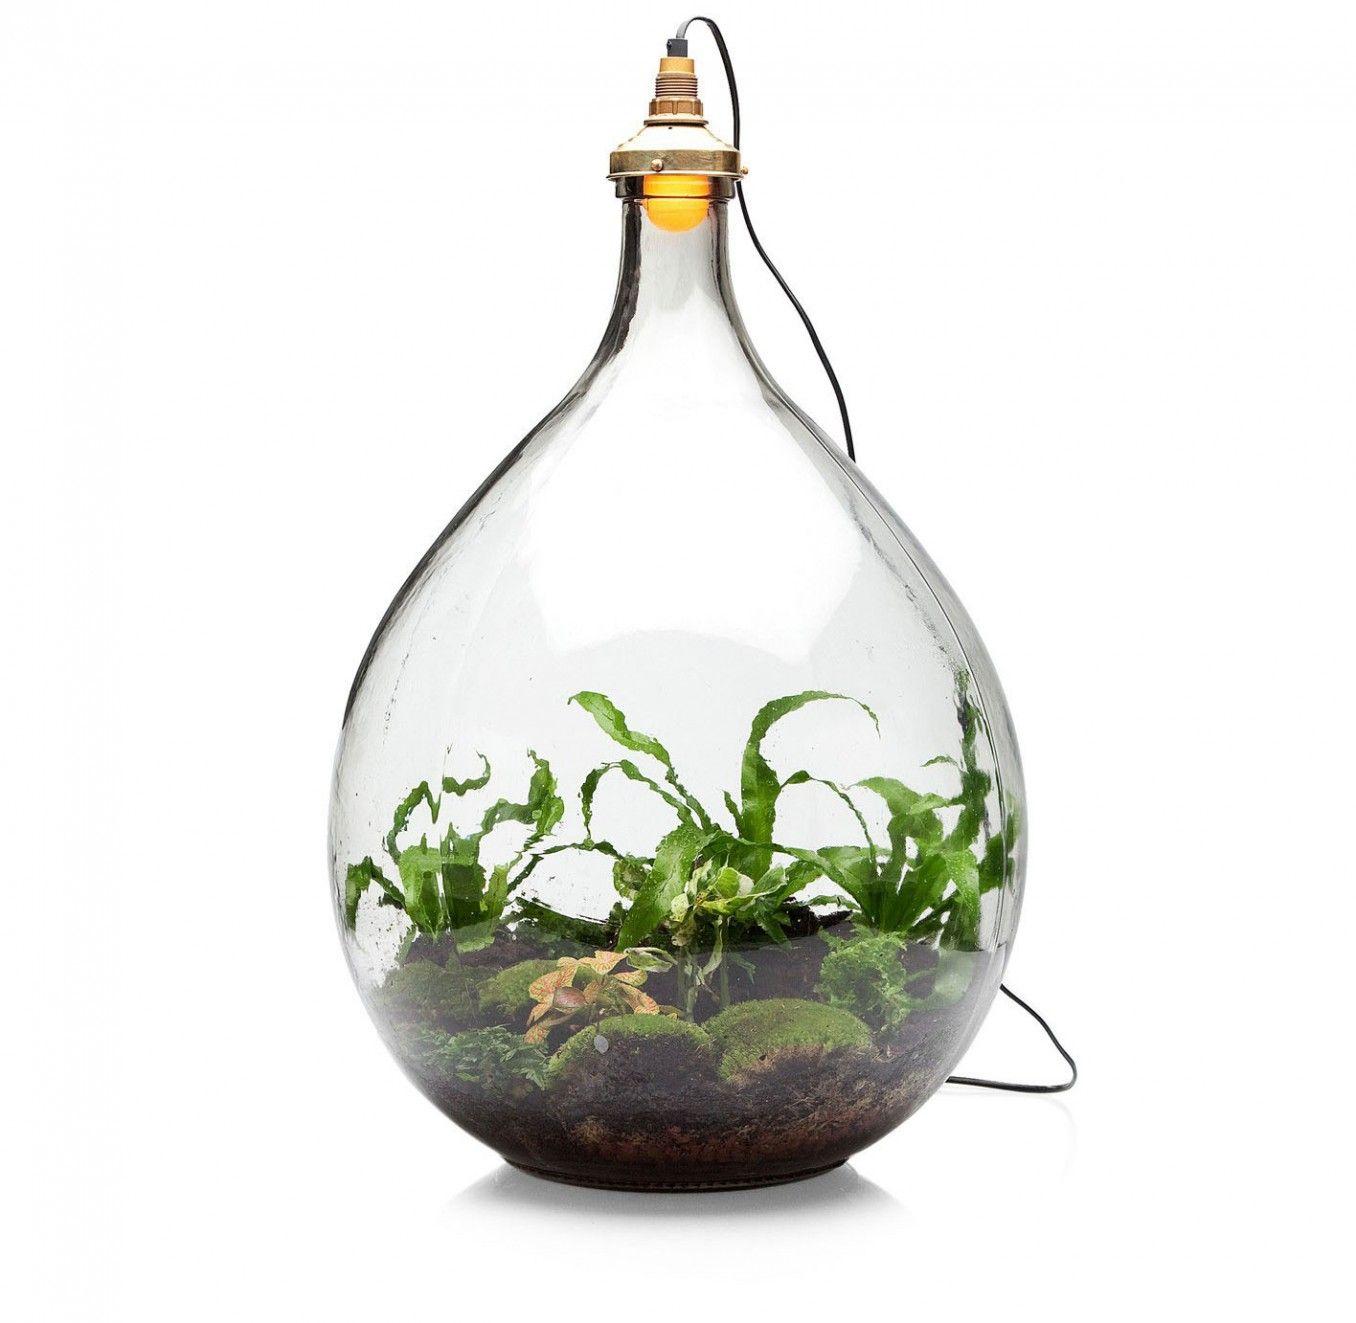 Plant In Glazen Pot.Self Sustaining Plant In Glazen Pot Lamp Plants Lampen